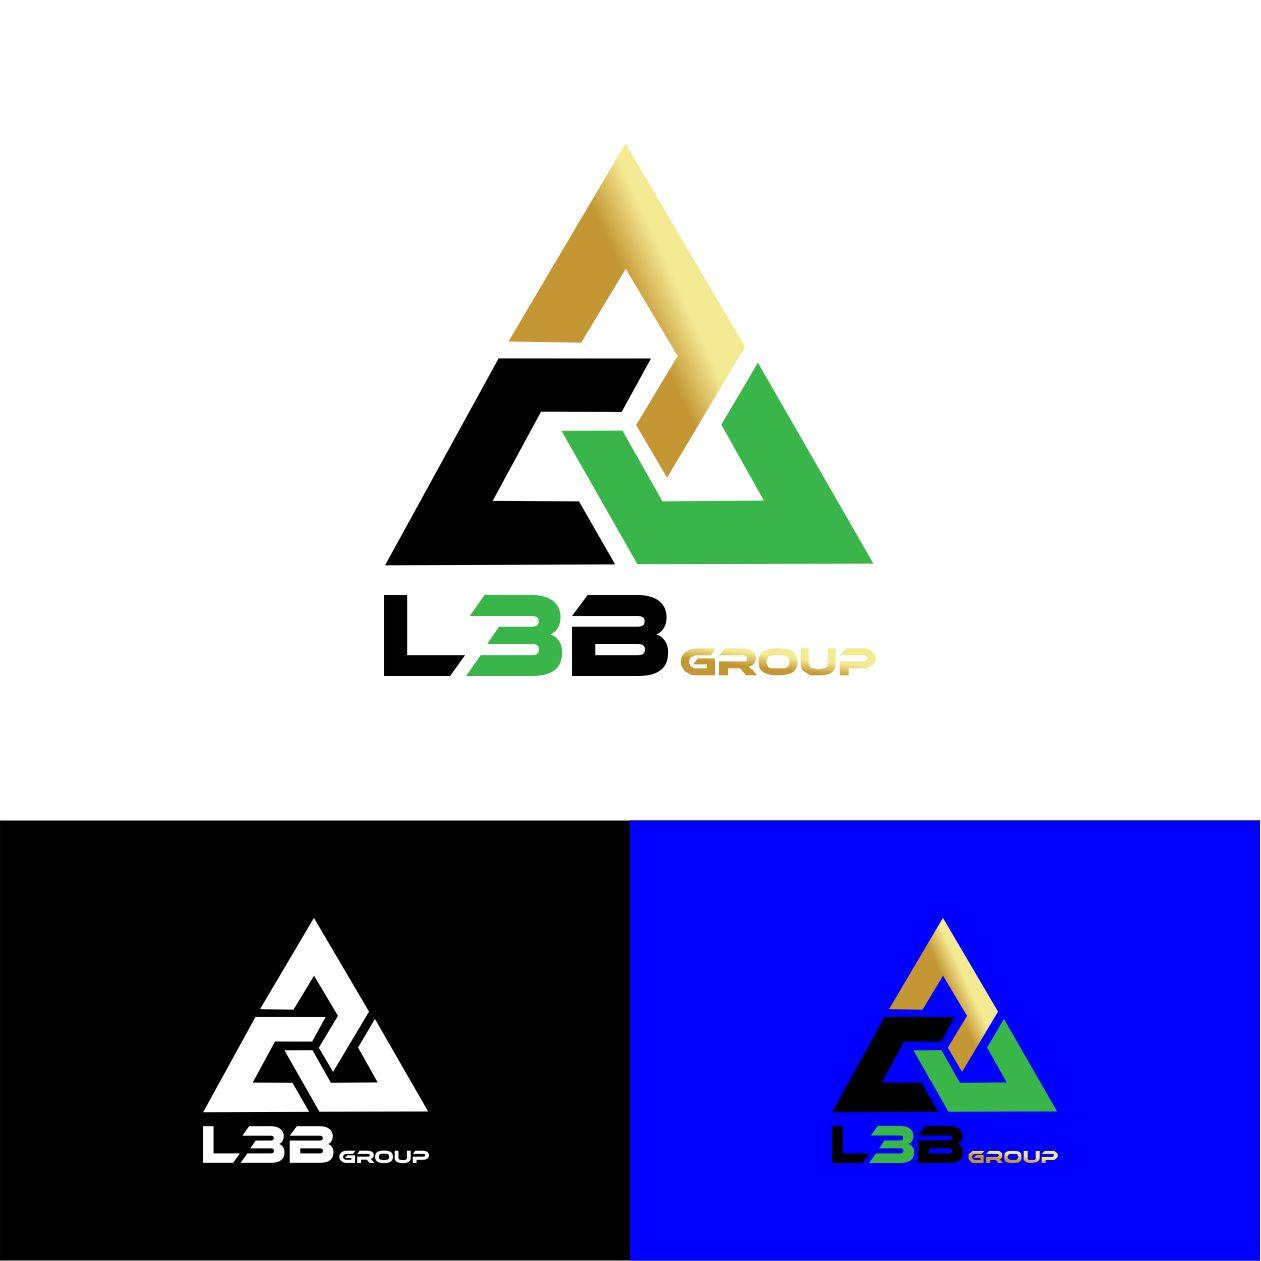 L998993-20201110132100.jpg